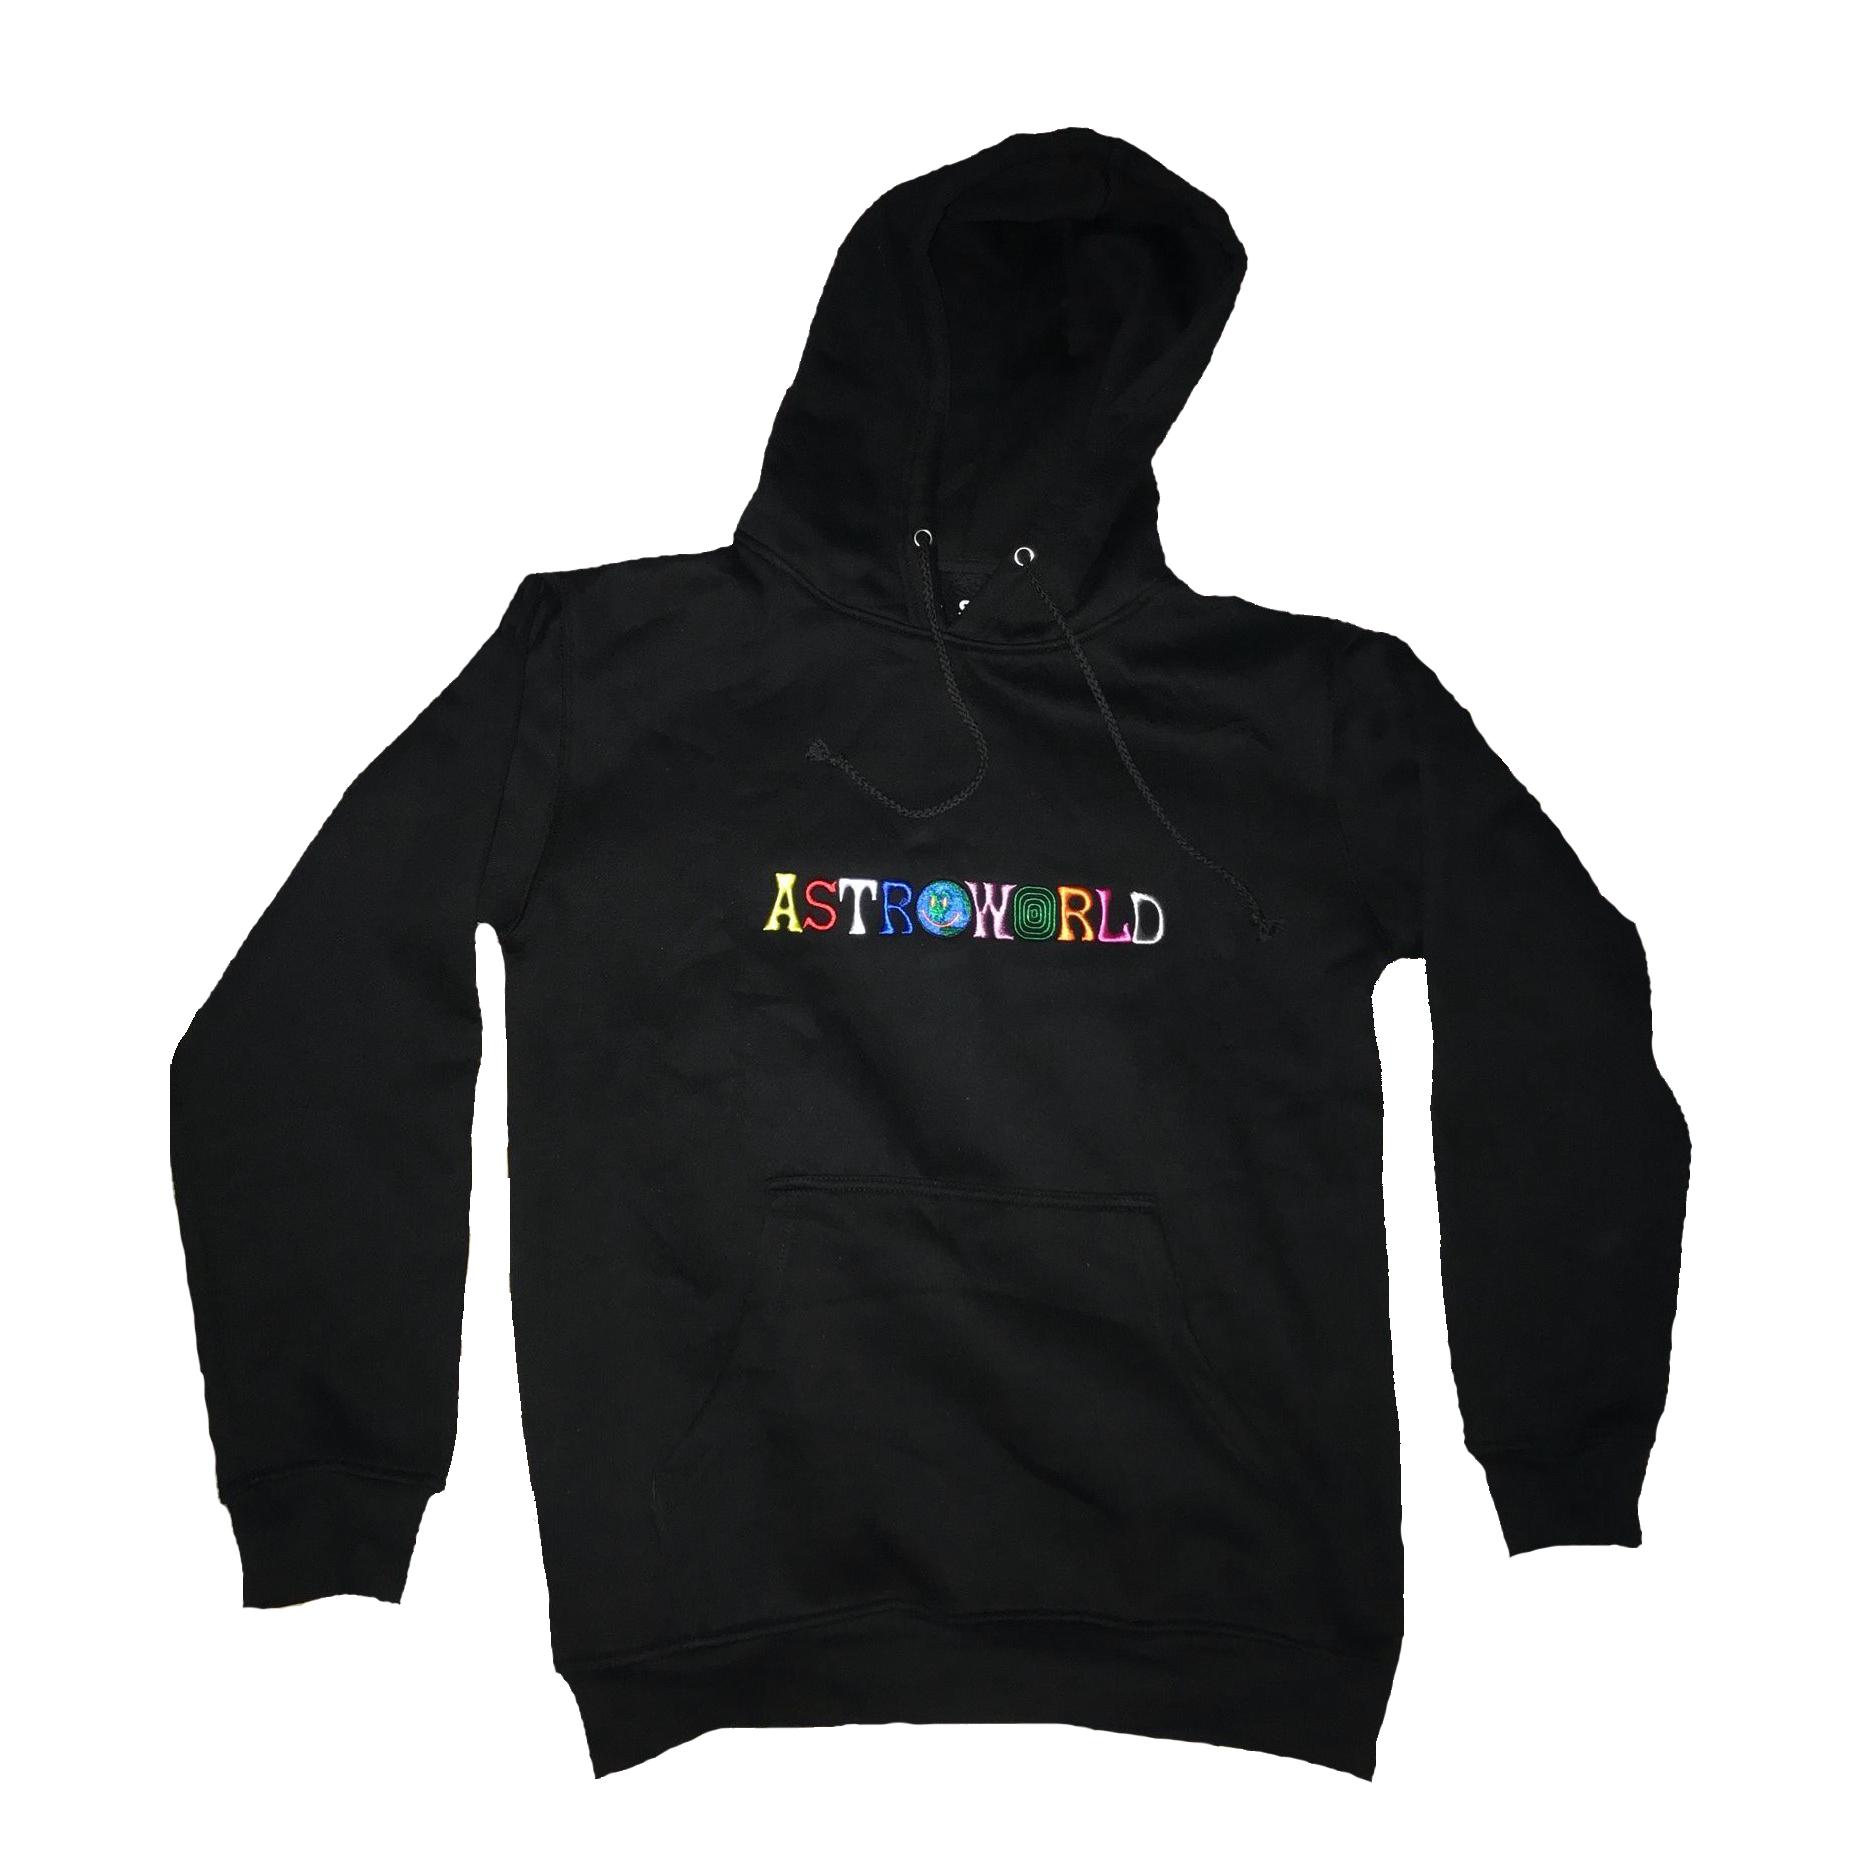 a basso prezzo 53088 f1f21 Astroworld 'Wish You Were Here' Hoodie in 2019 | wish list ...